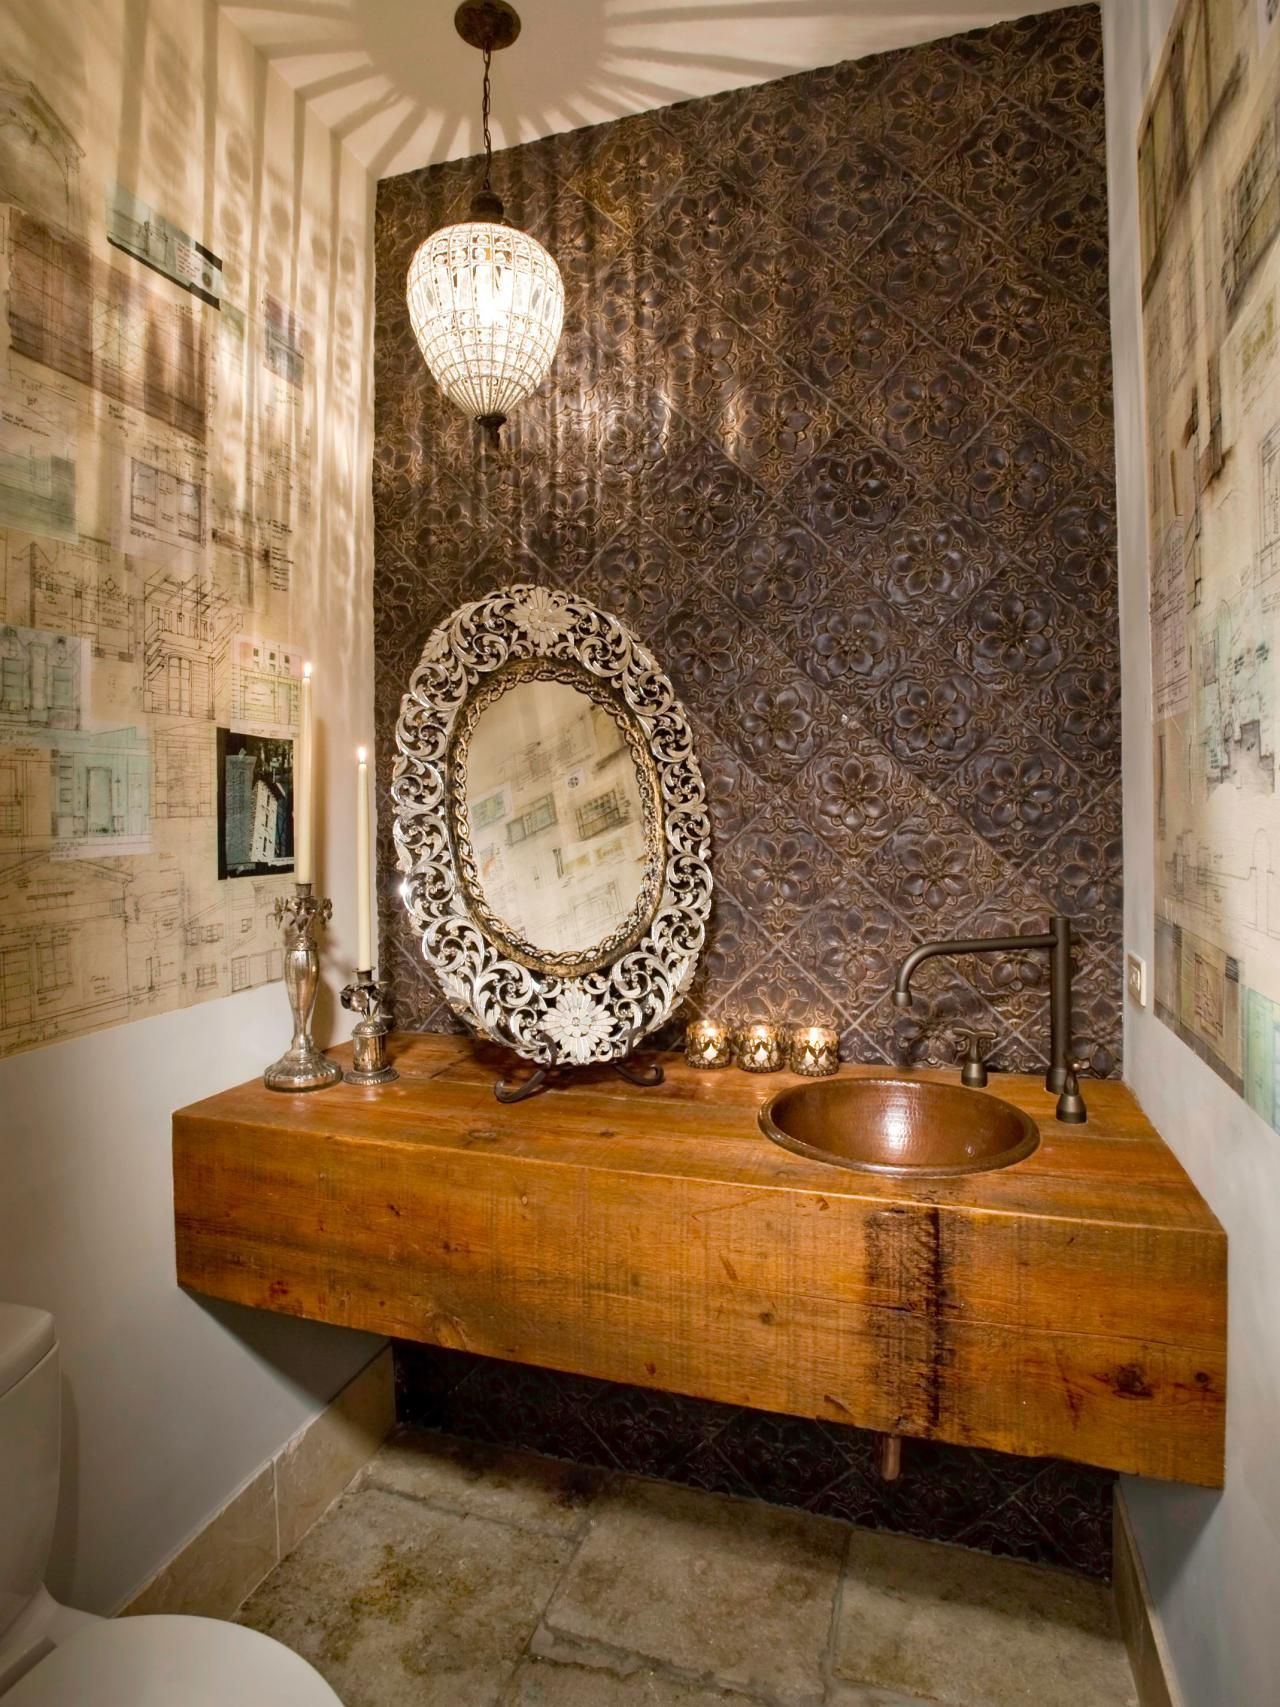 Romantic Bathroom Lighting Ideas | !Decor I Like | Pinterest | Space ...